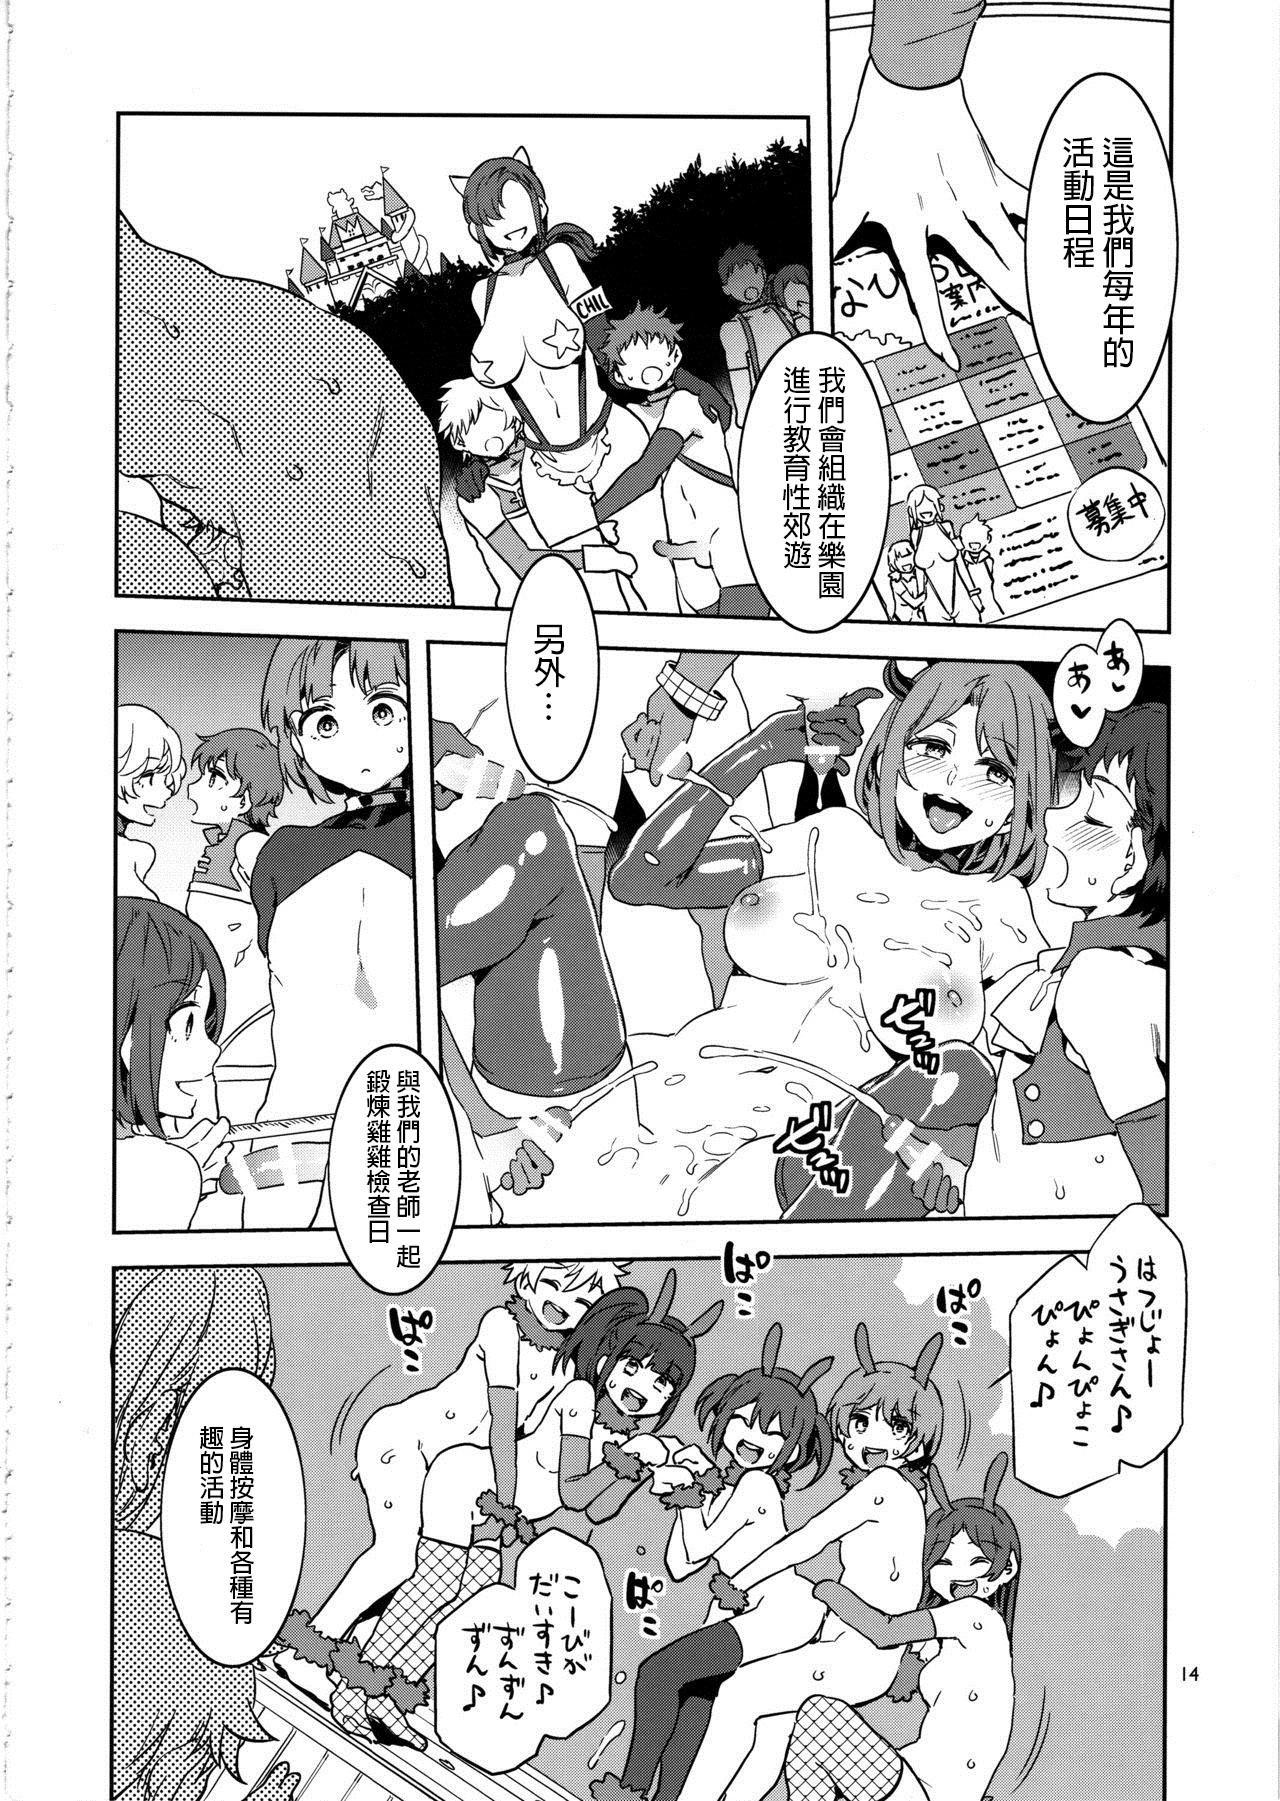 Oideyo! Mizuryu Kei Land the 8th day 12